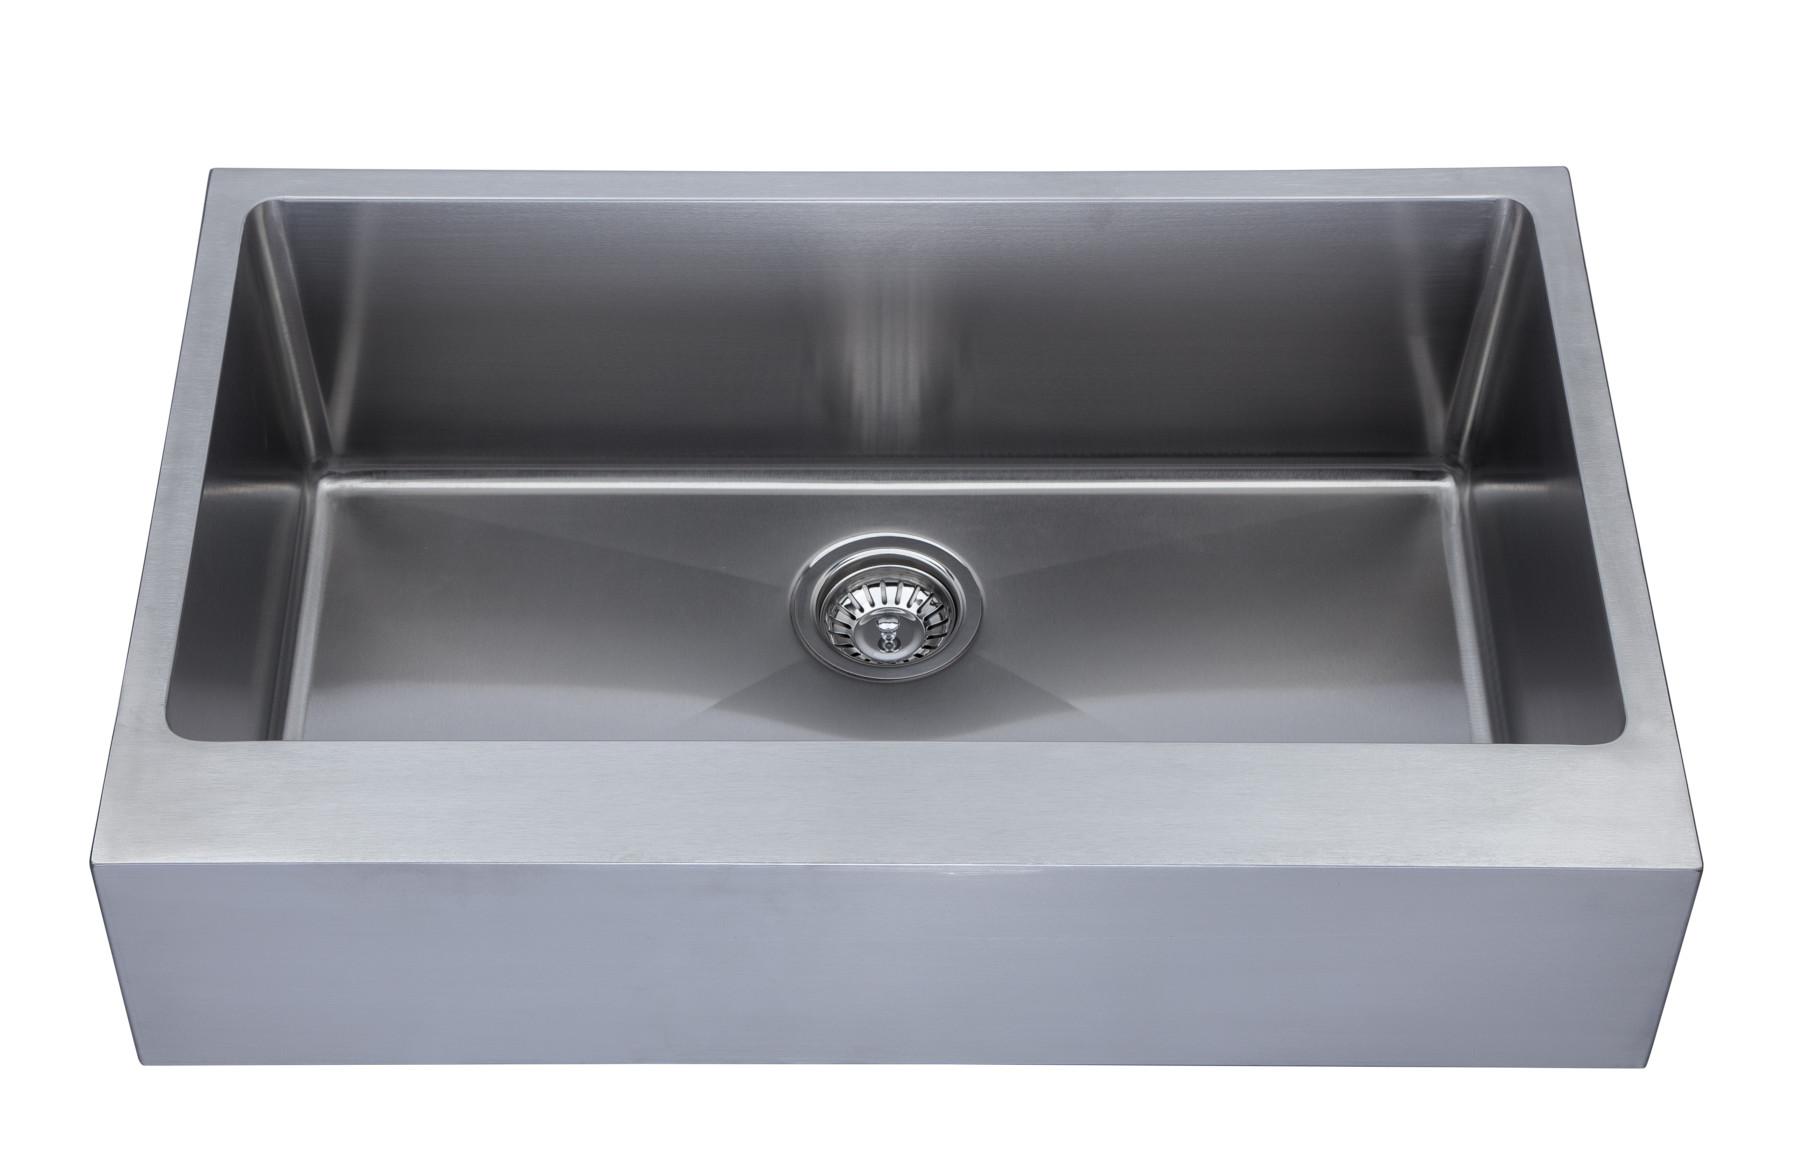 kitchen sink           as350a 31 25   x 20   x 9   18g single bowl apron legend stainless      rh   amerisink com